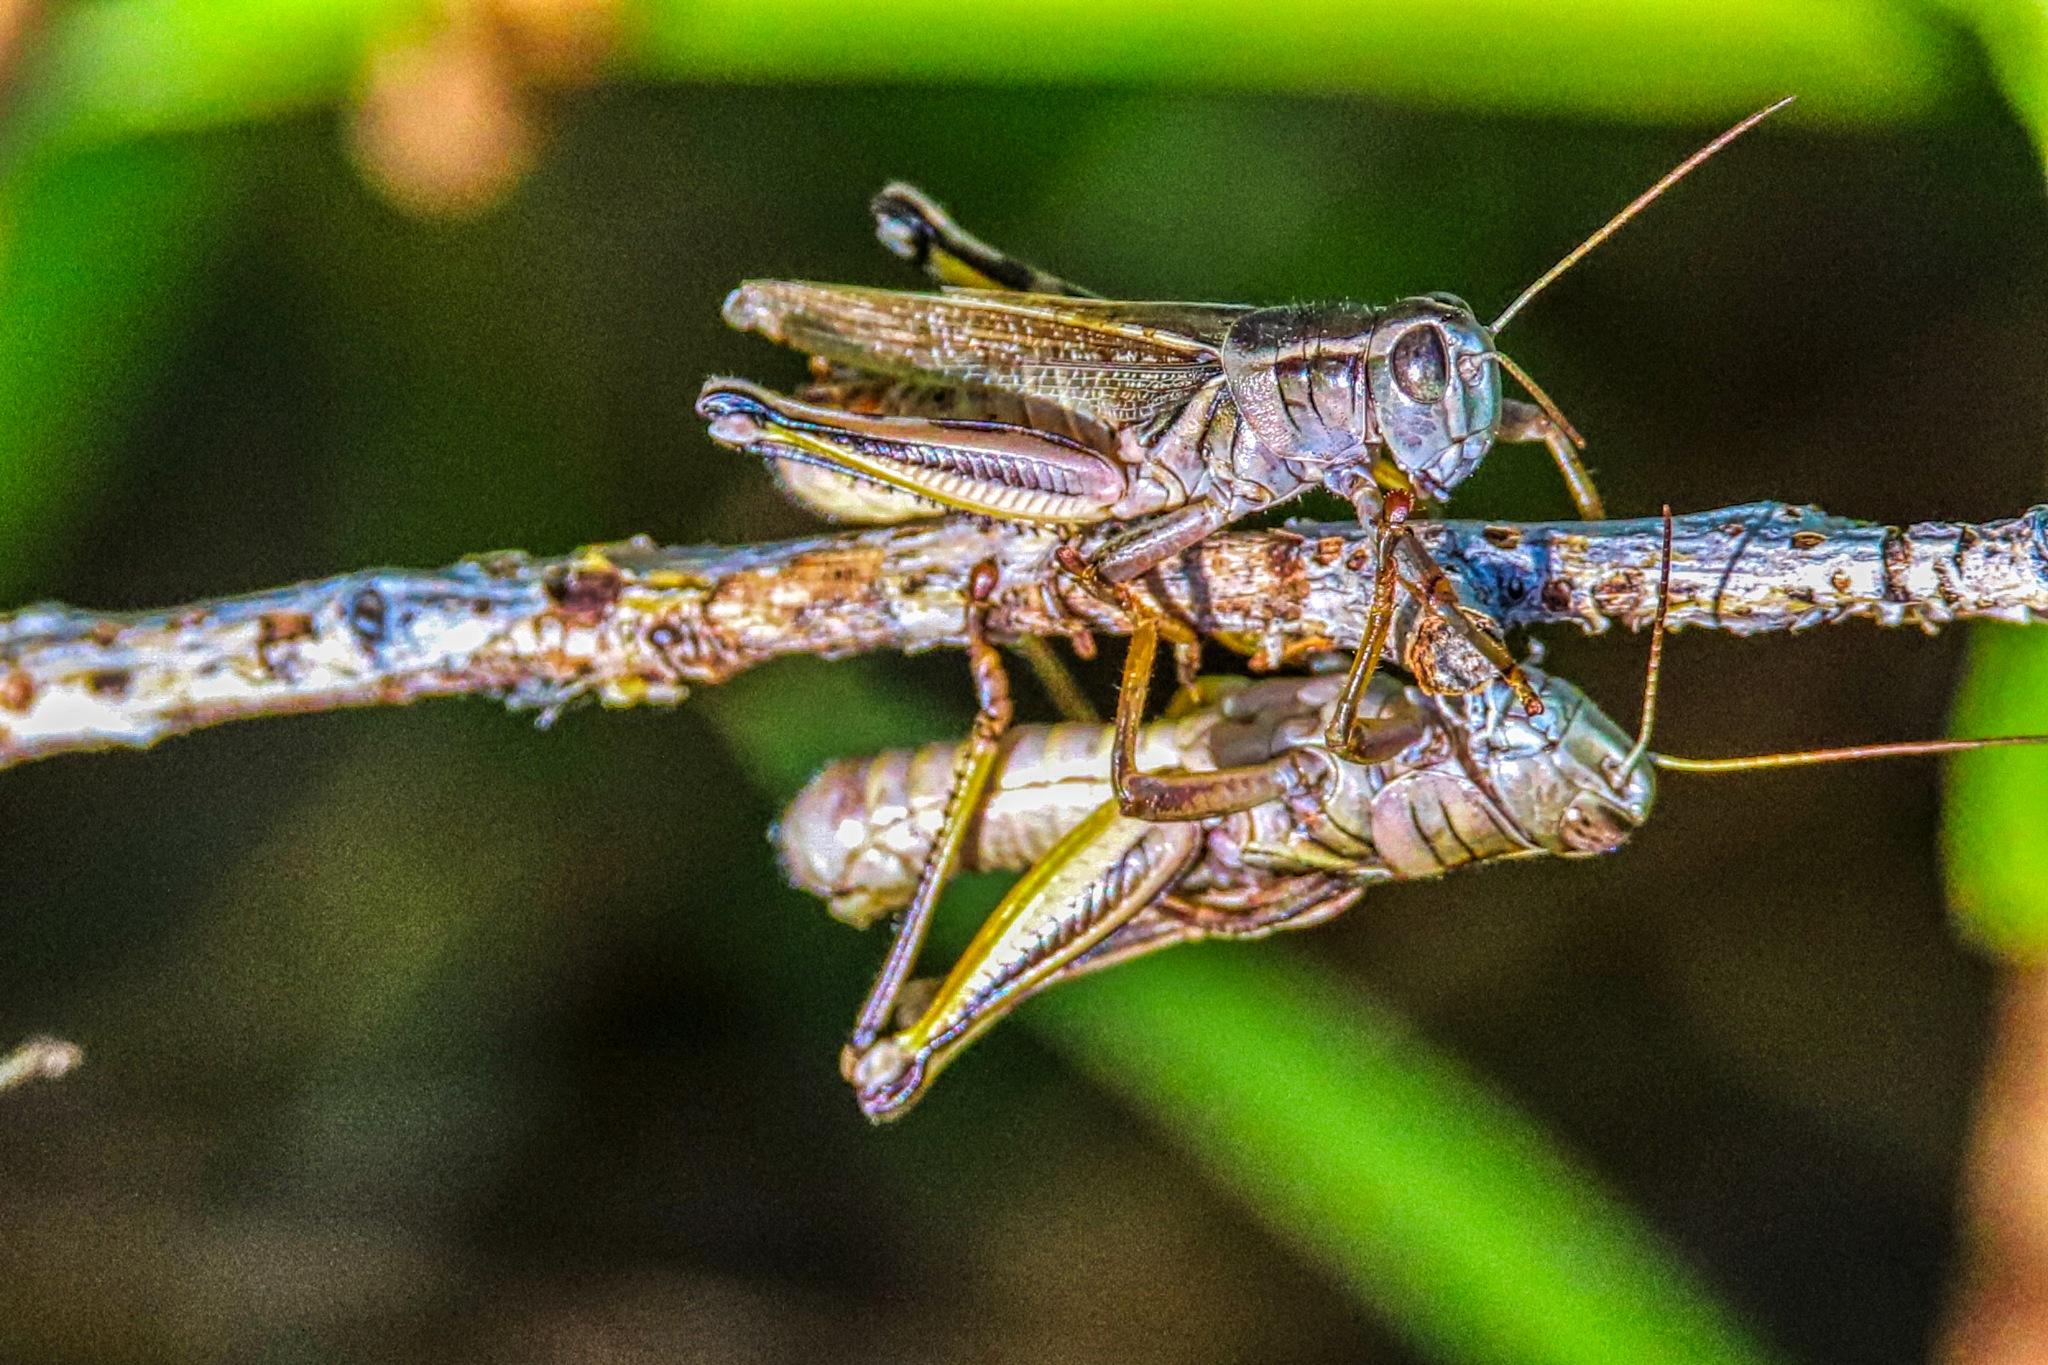 Grasshoppers by James Stewart